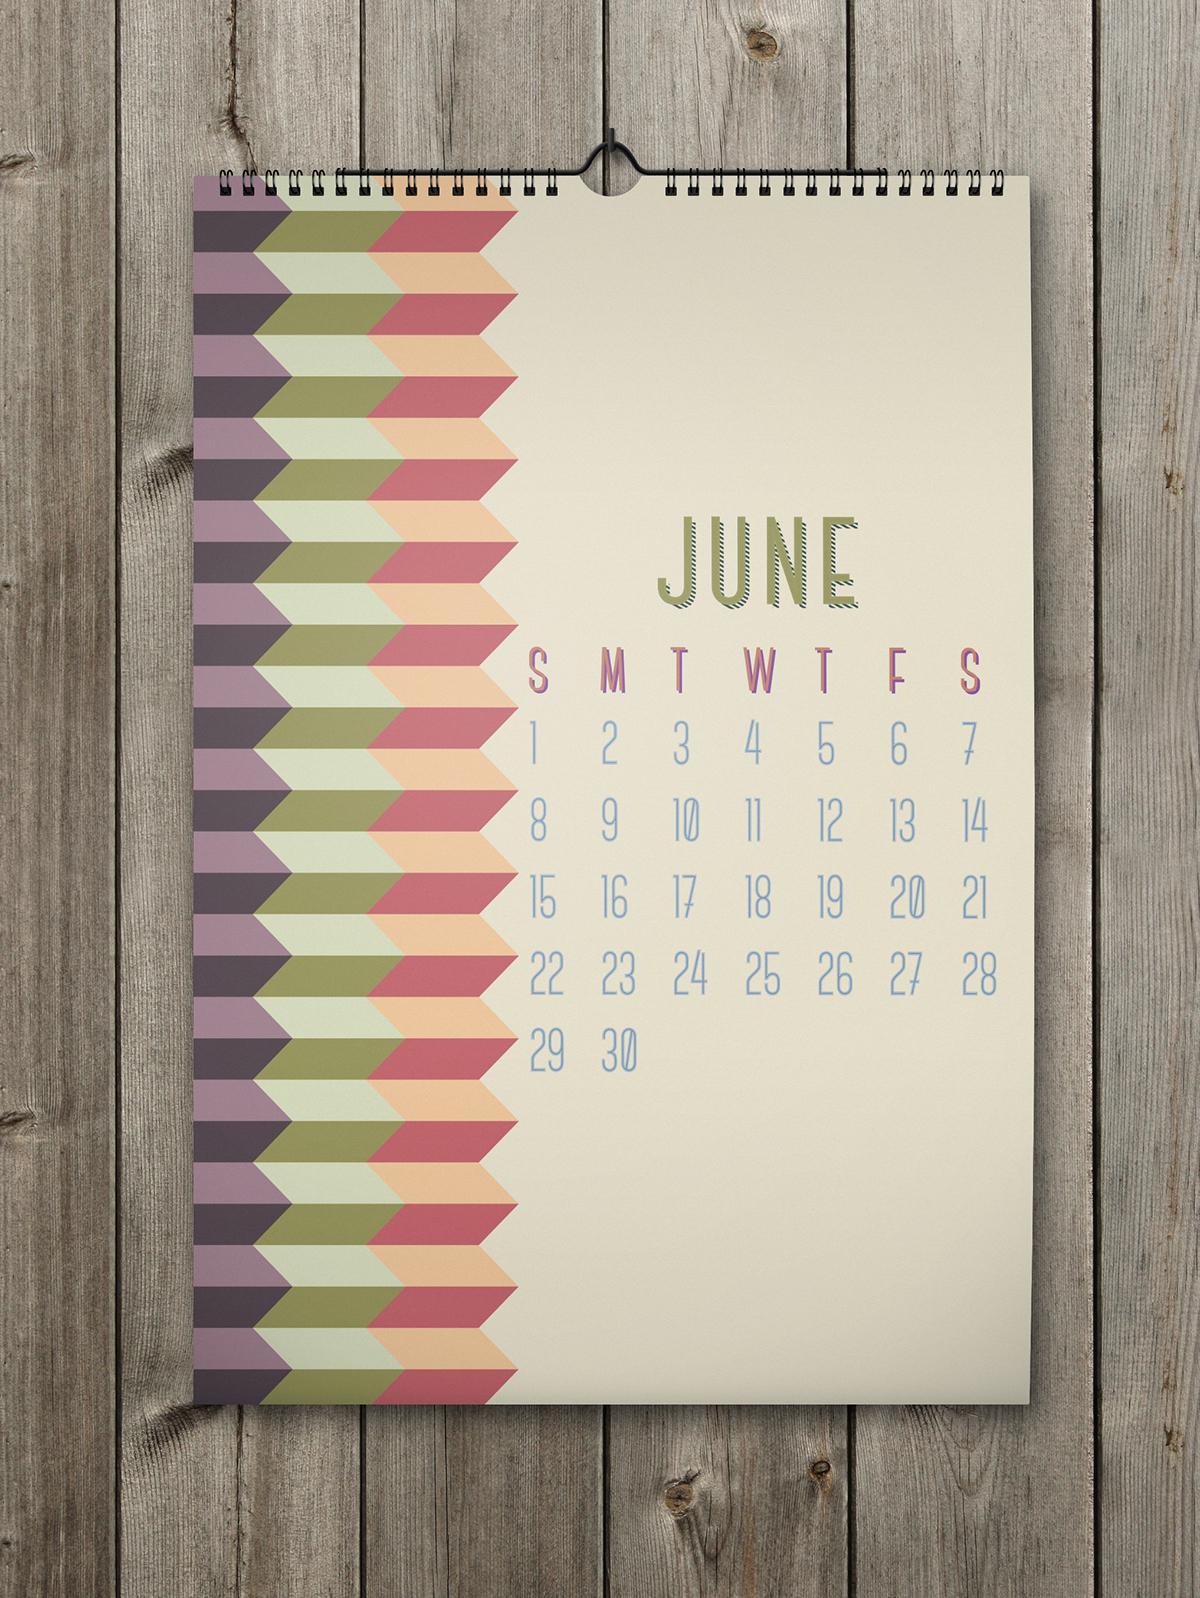 2014 Calendar shapes lines pattern new year agenda Christmas xmas colors Forms Palermo sicily abstract Shades calendario